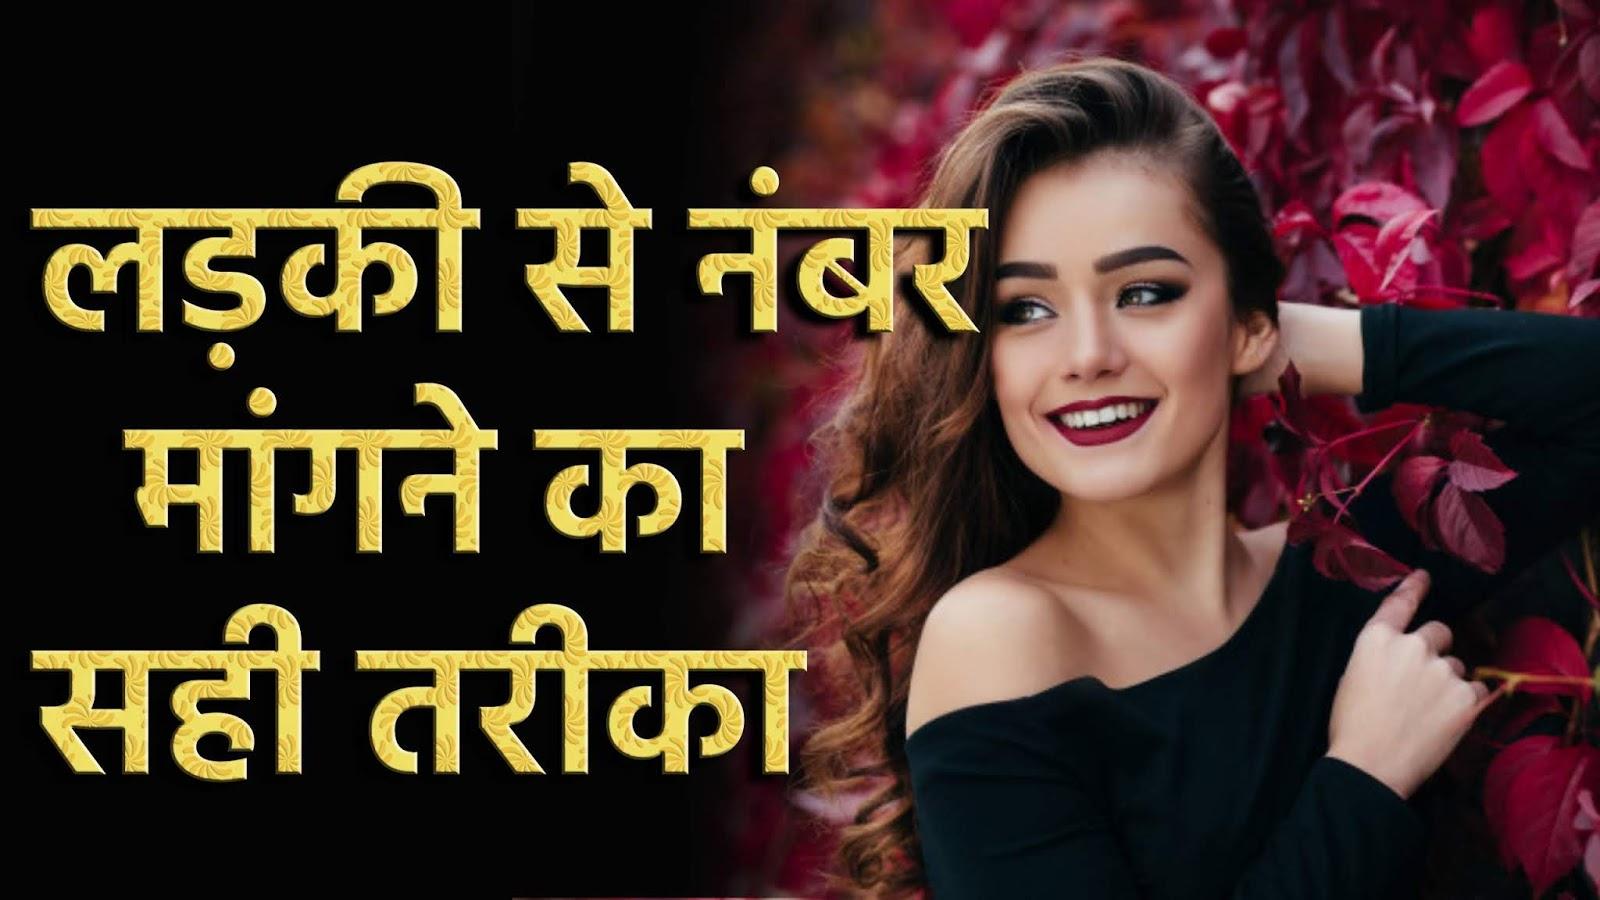 Ladki Ka Number Mangne Ka (MASTER PLAN) Tarika || लड़की से नंबर मांगने का सही तरीका